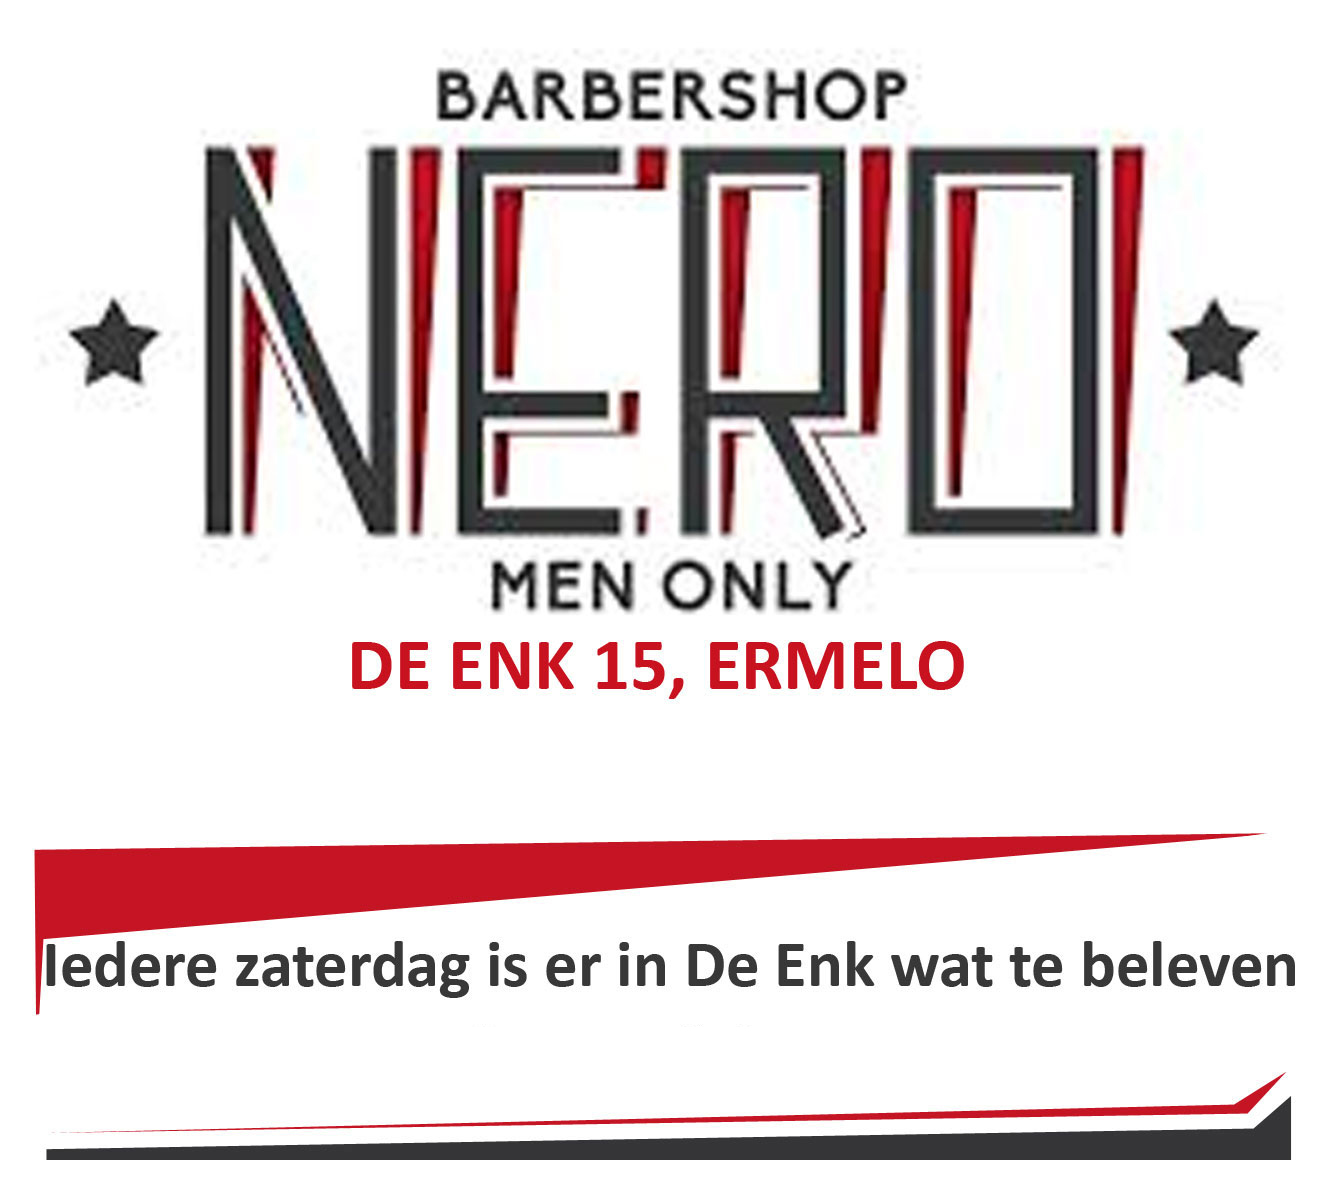 Nero Barbershop